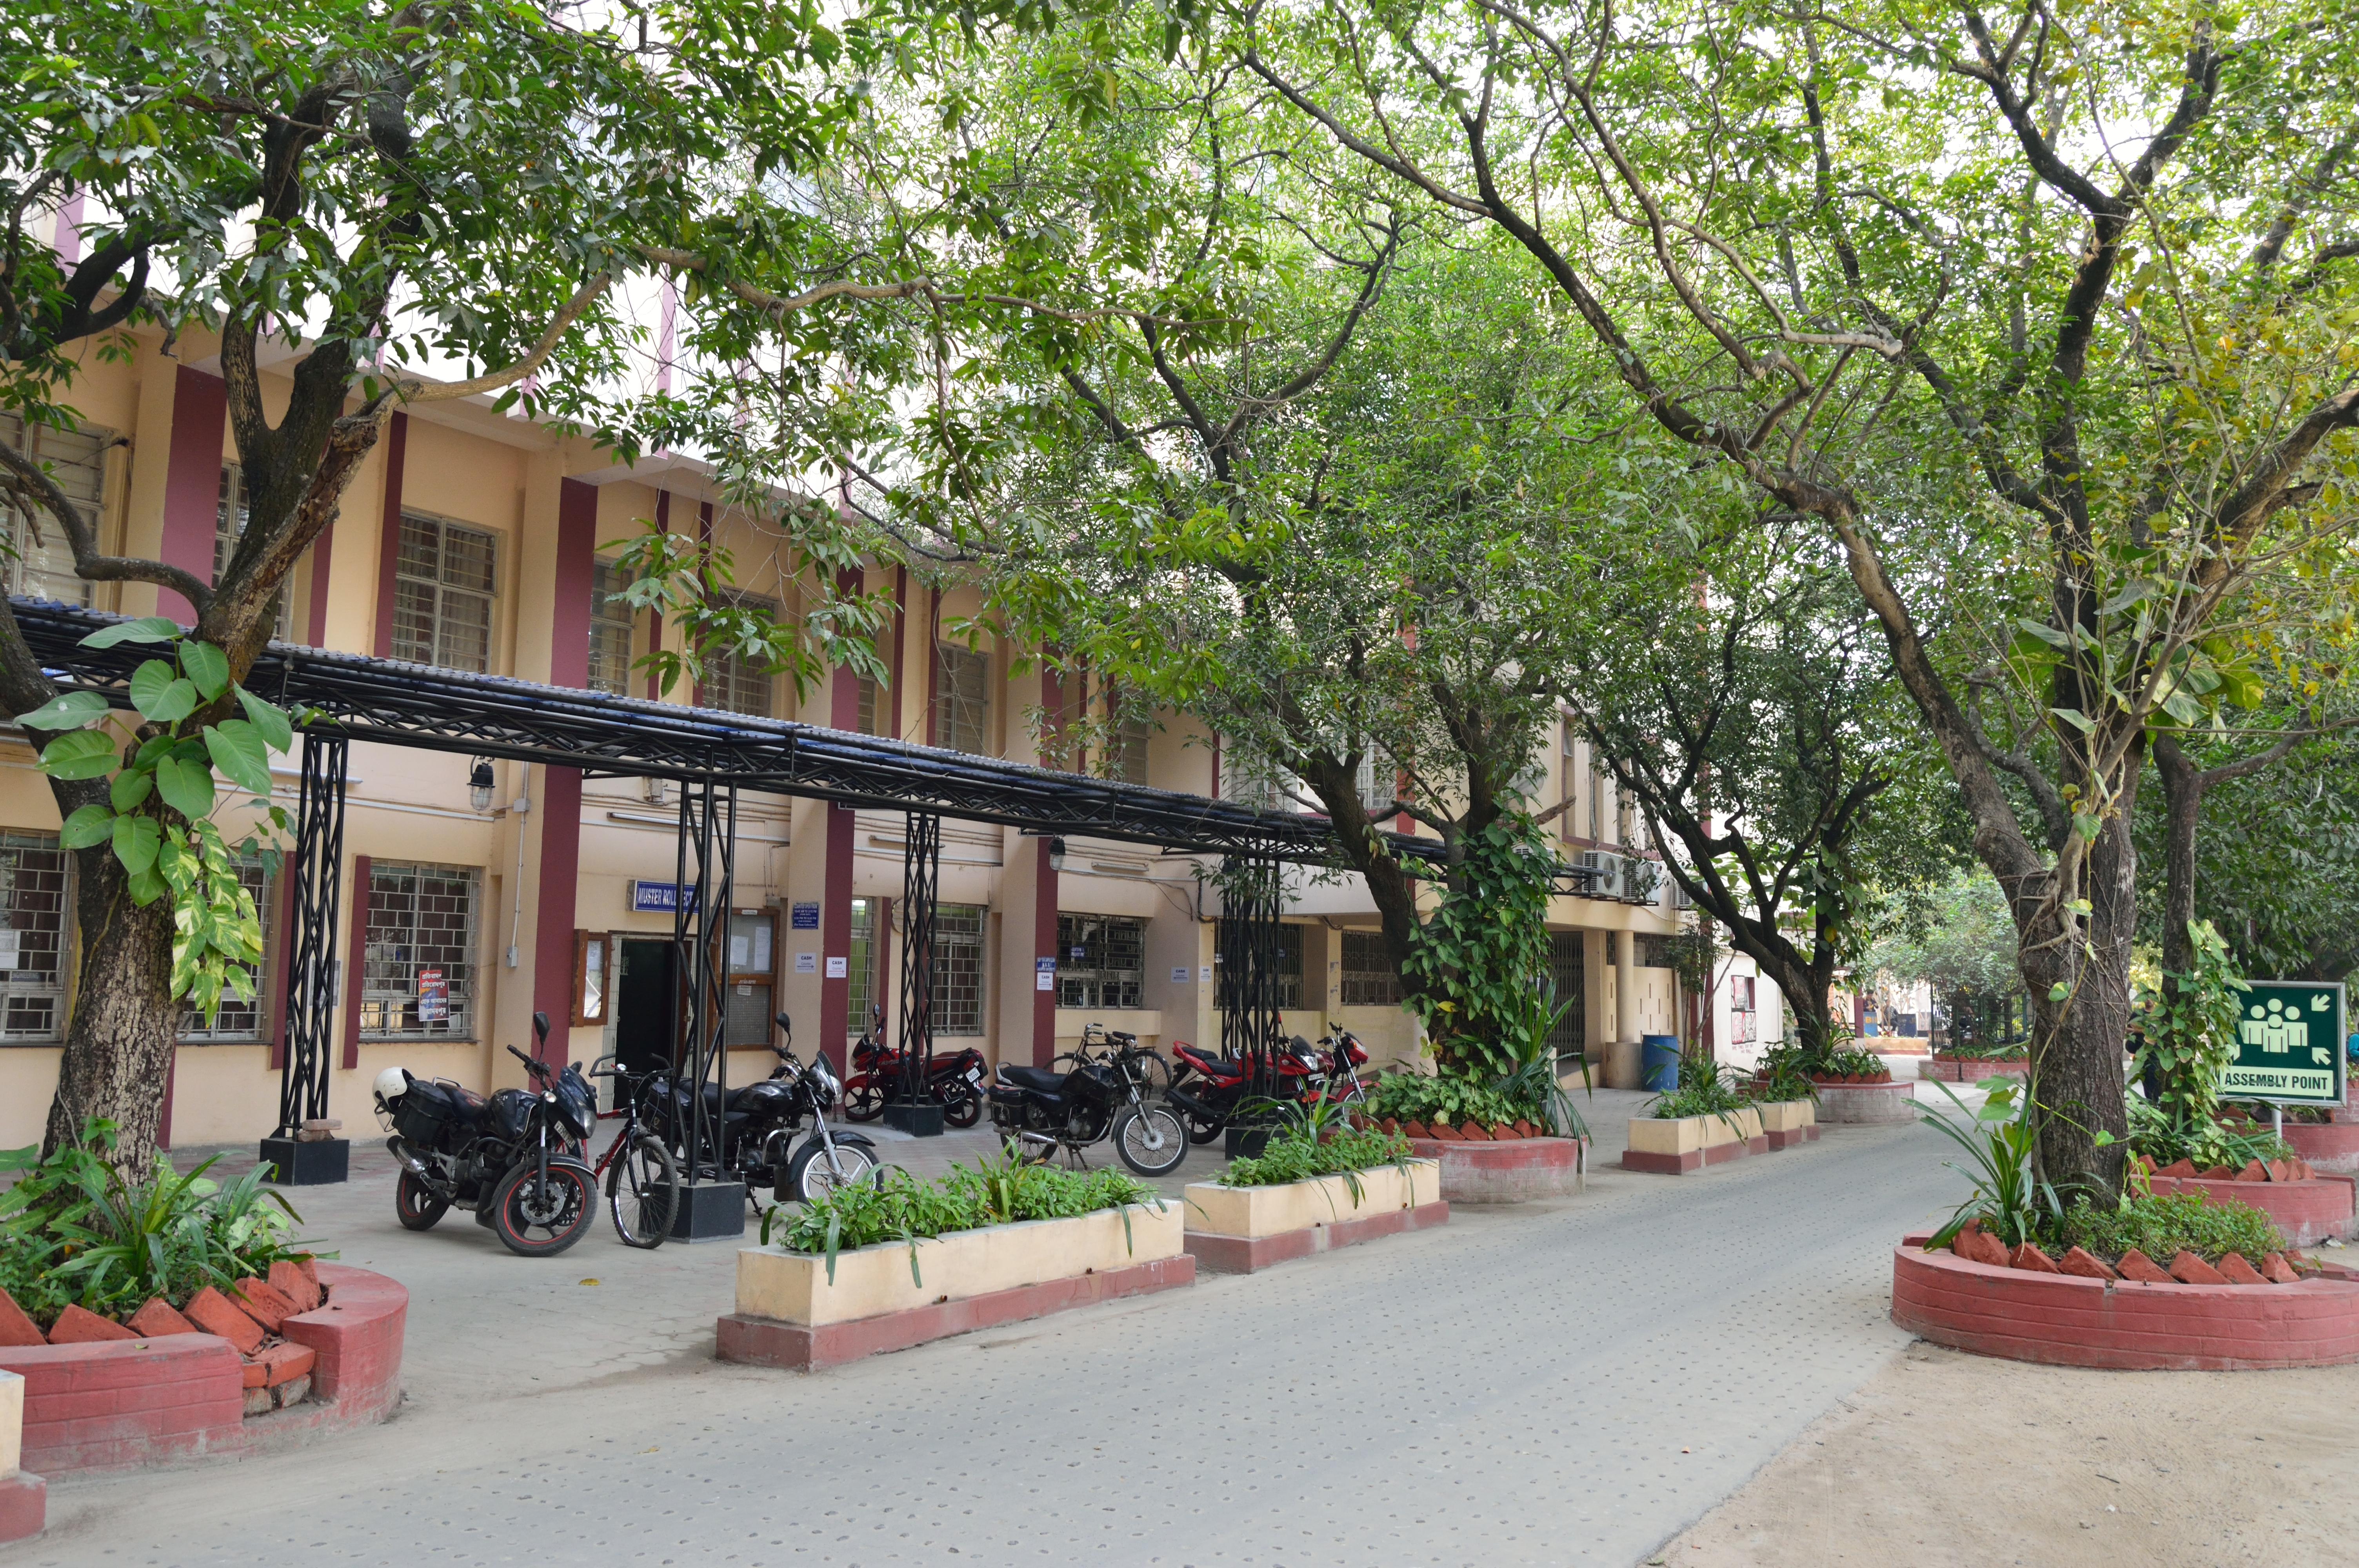 File:Aurobindo Bhavan - Main Administrative Building - Jadavpur University - Kolkata 2015-01